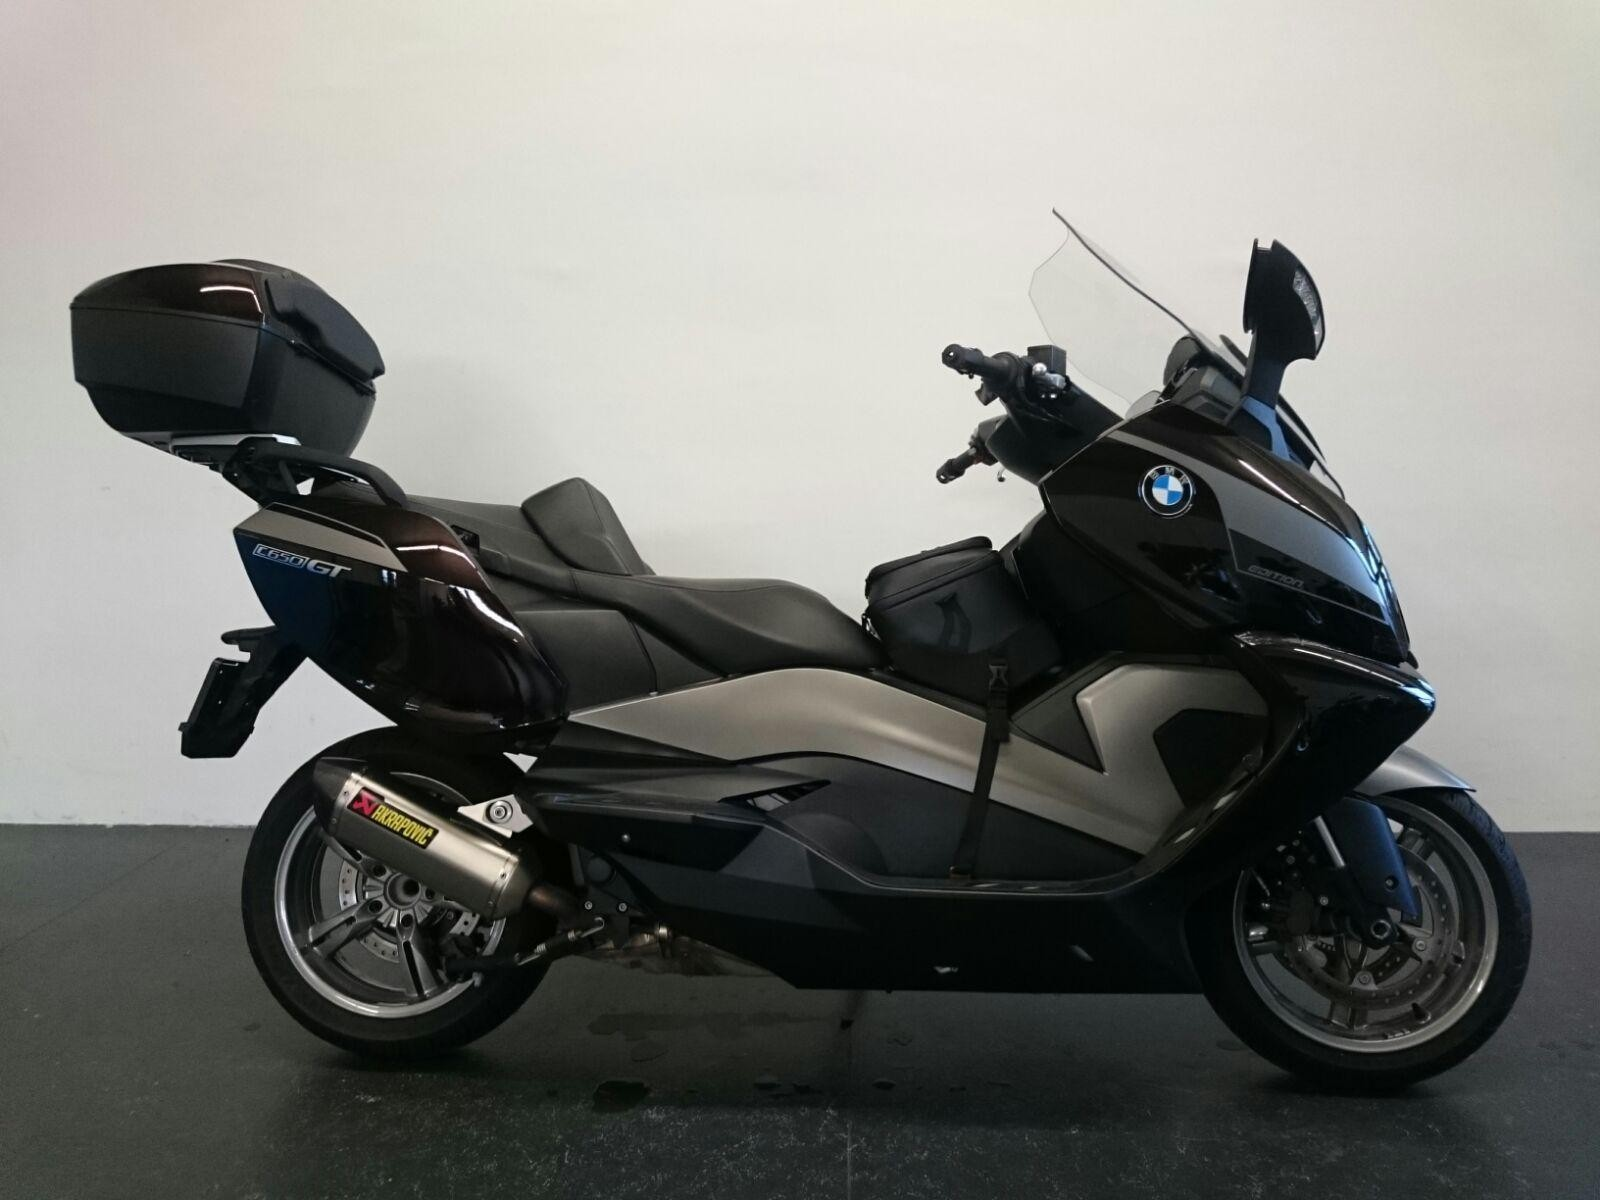 motorrad occasion kaufen bmw c 650 gt abs asc arrigoni sport gmbh adliswil. Black Bedroom Furniture Sets. Home Design Ideas